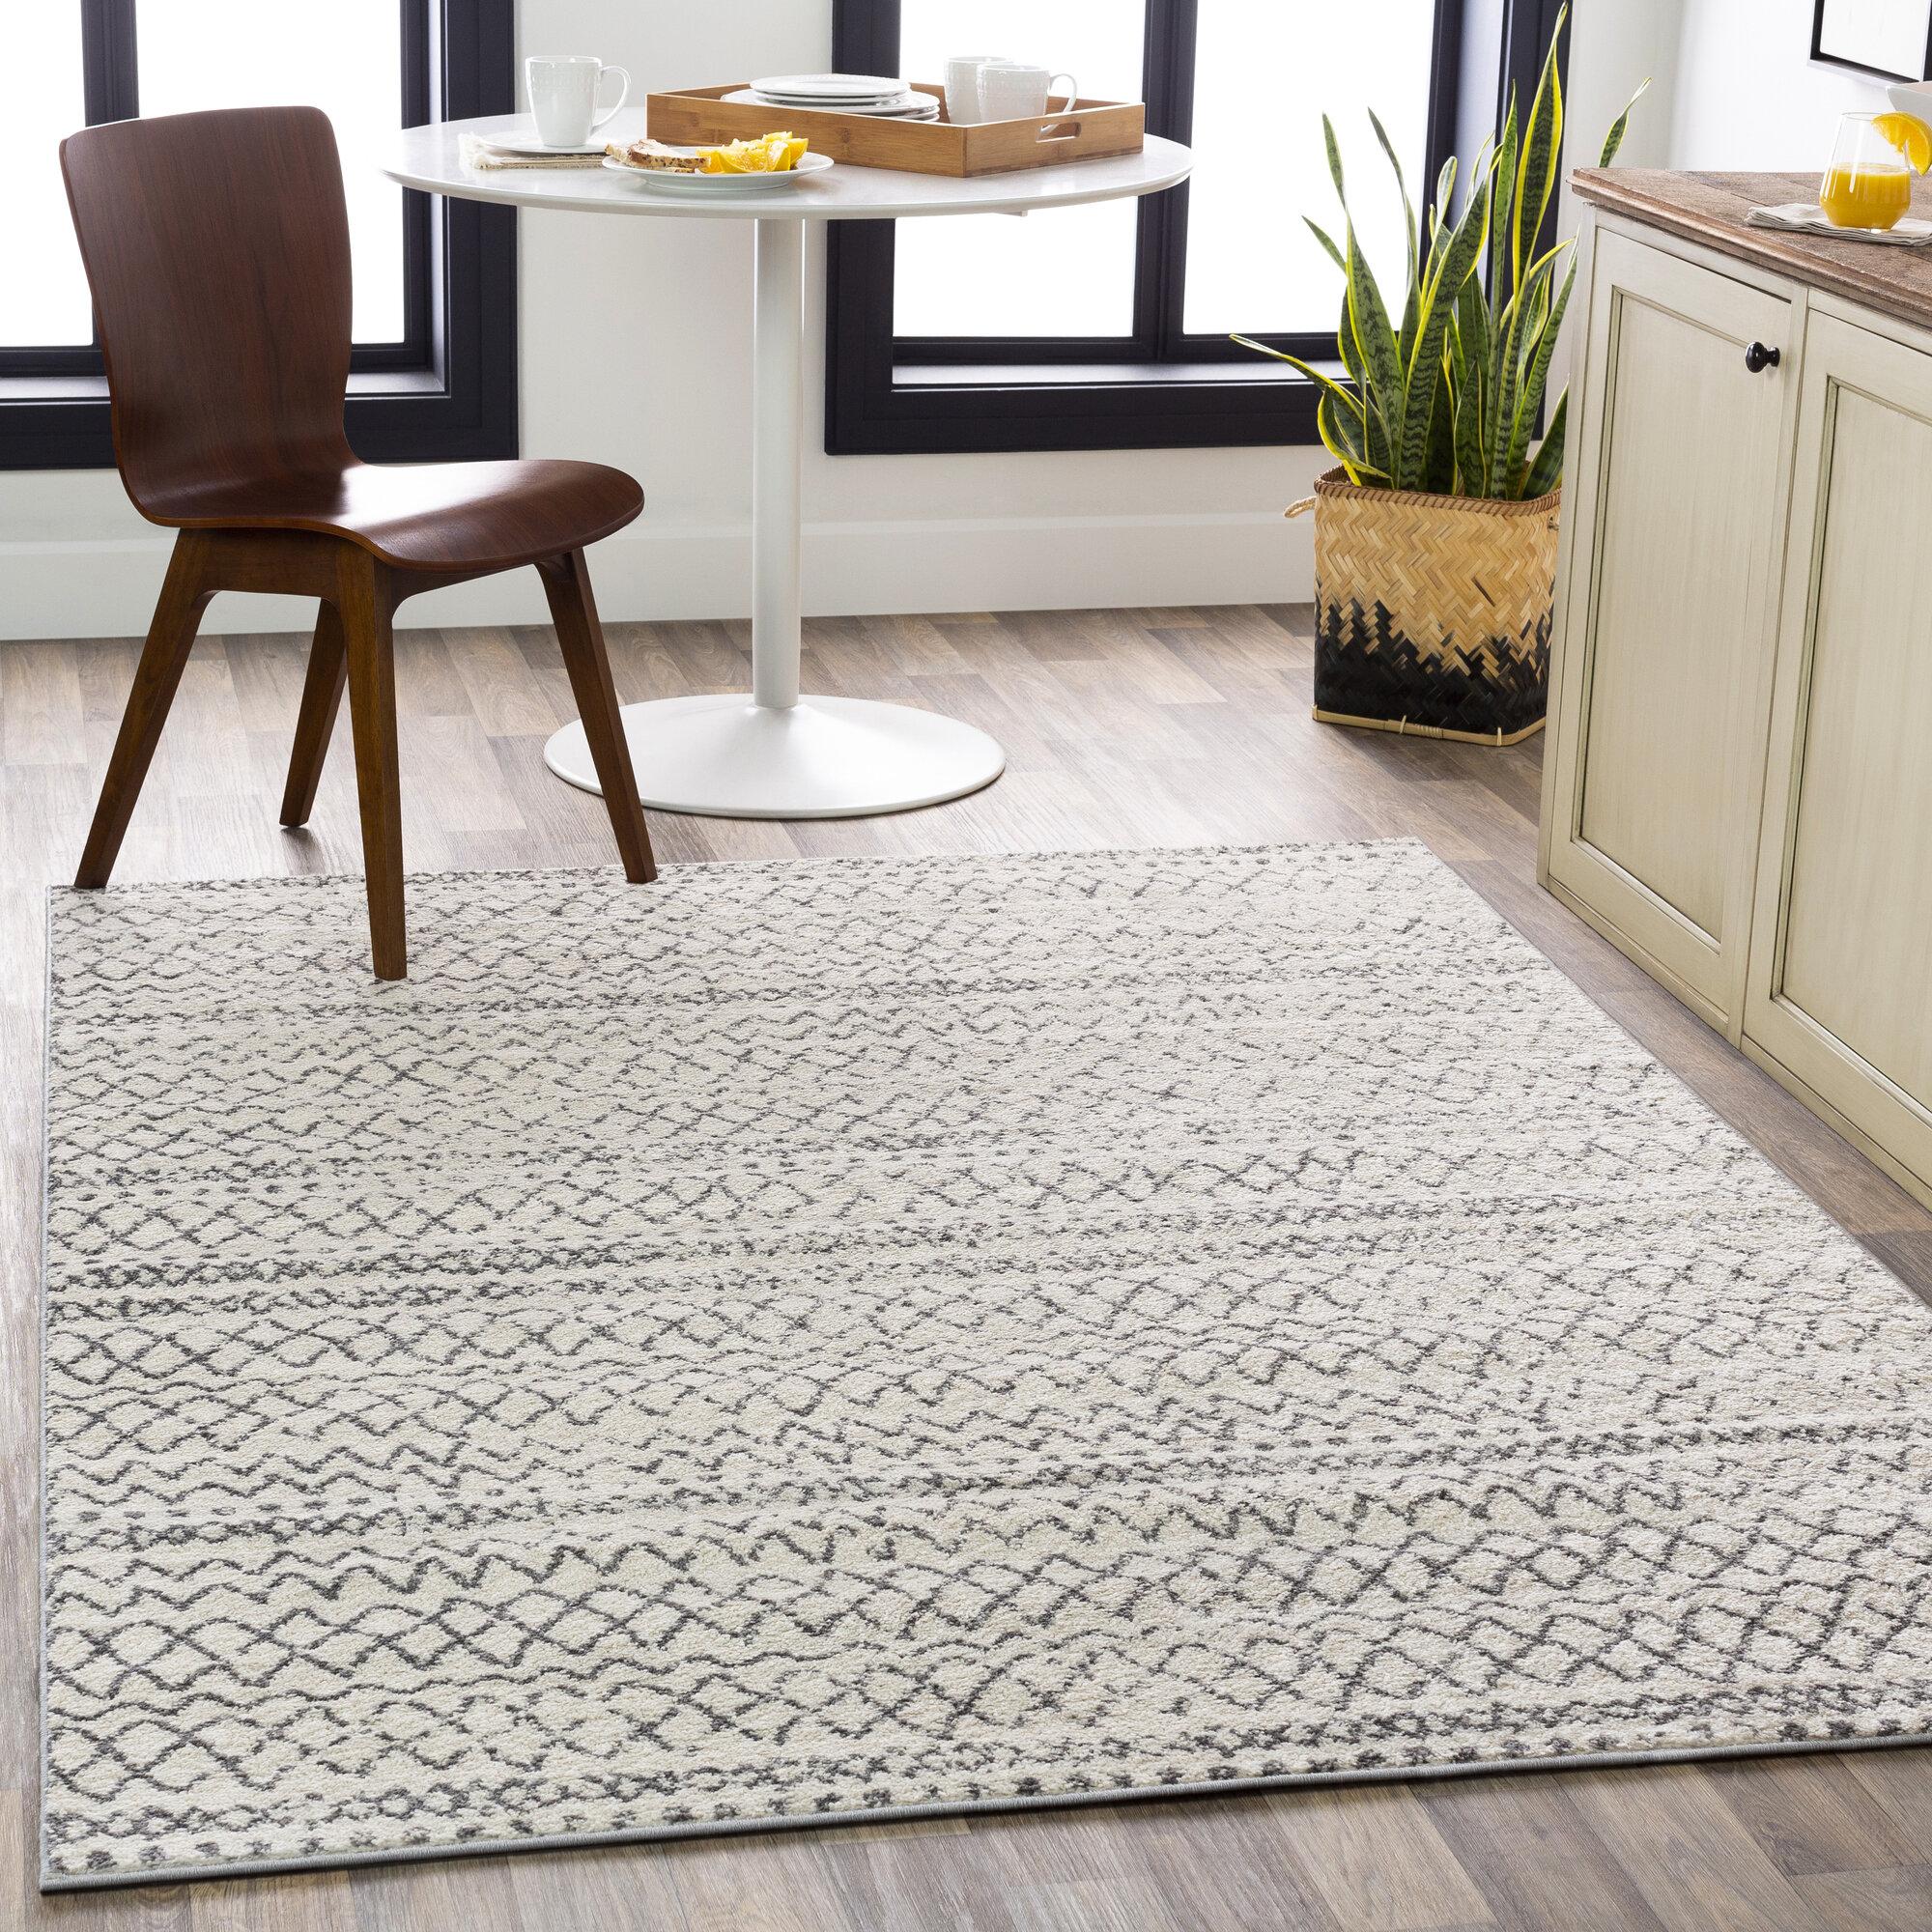 Union Rustic Maid Geometric Gray White Area Rug Reviews Wayfair